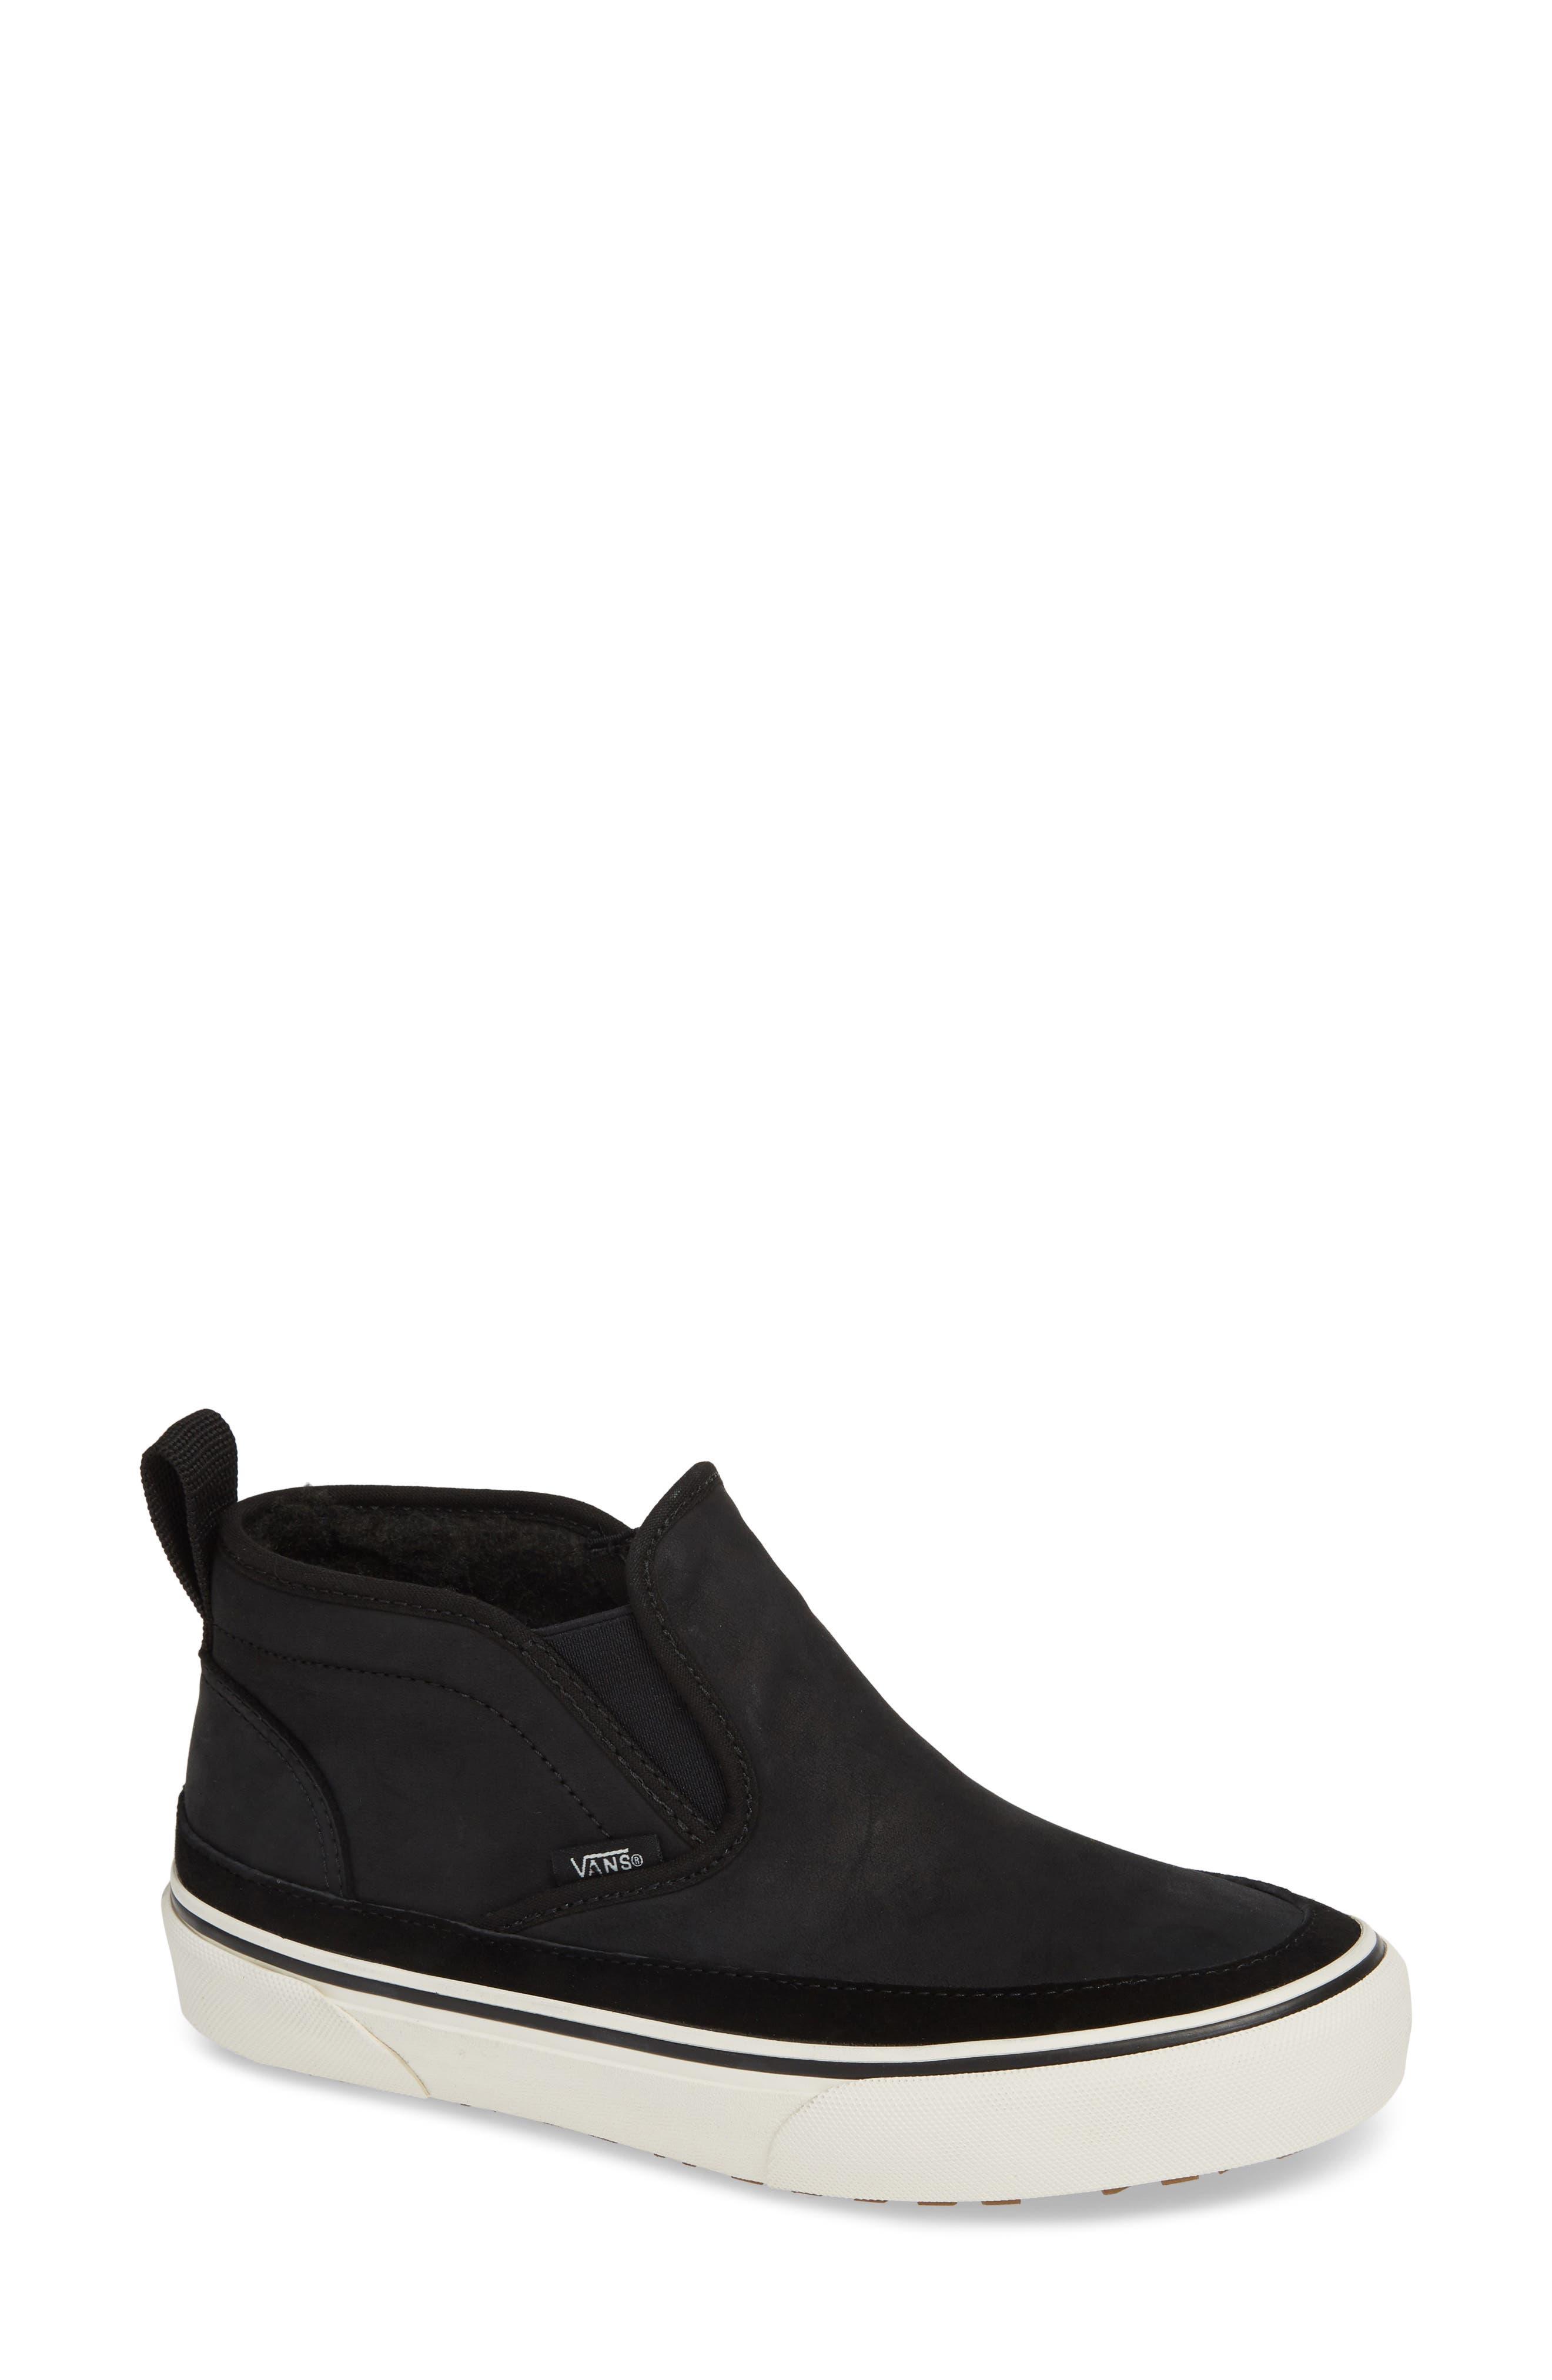 Vans Ua Authentic Mte Slip-On Sneaker, Black